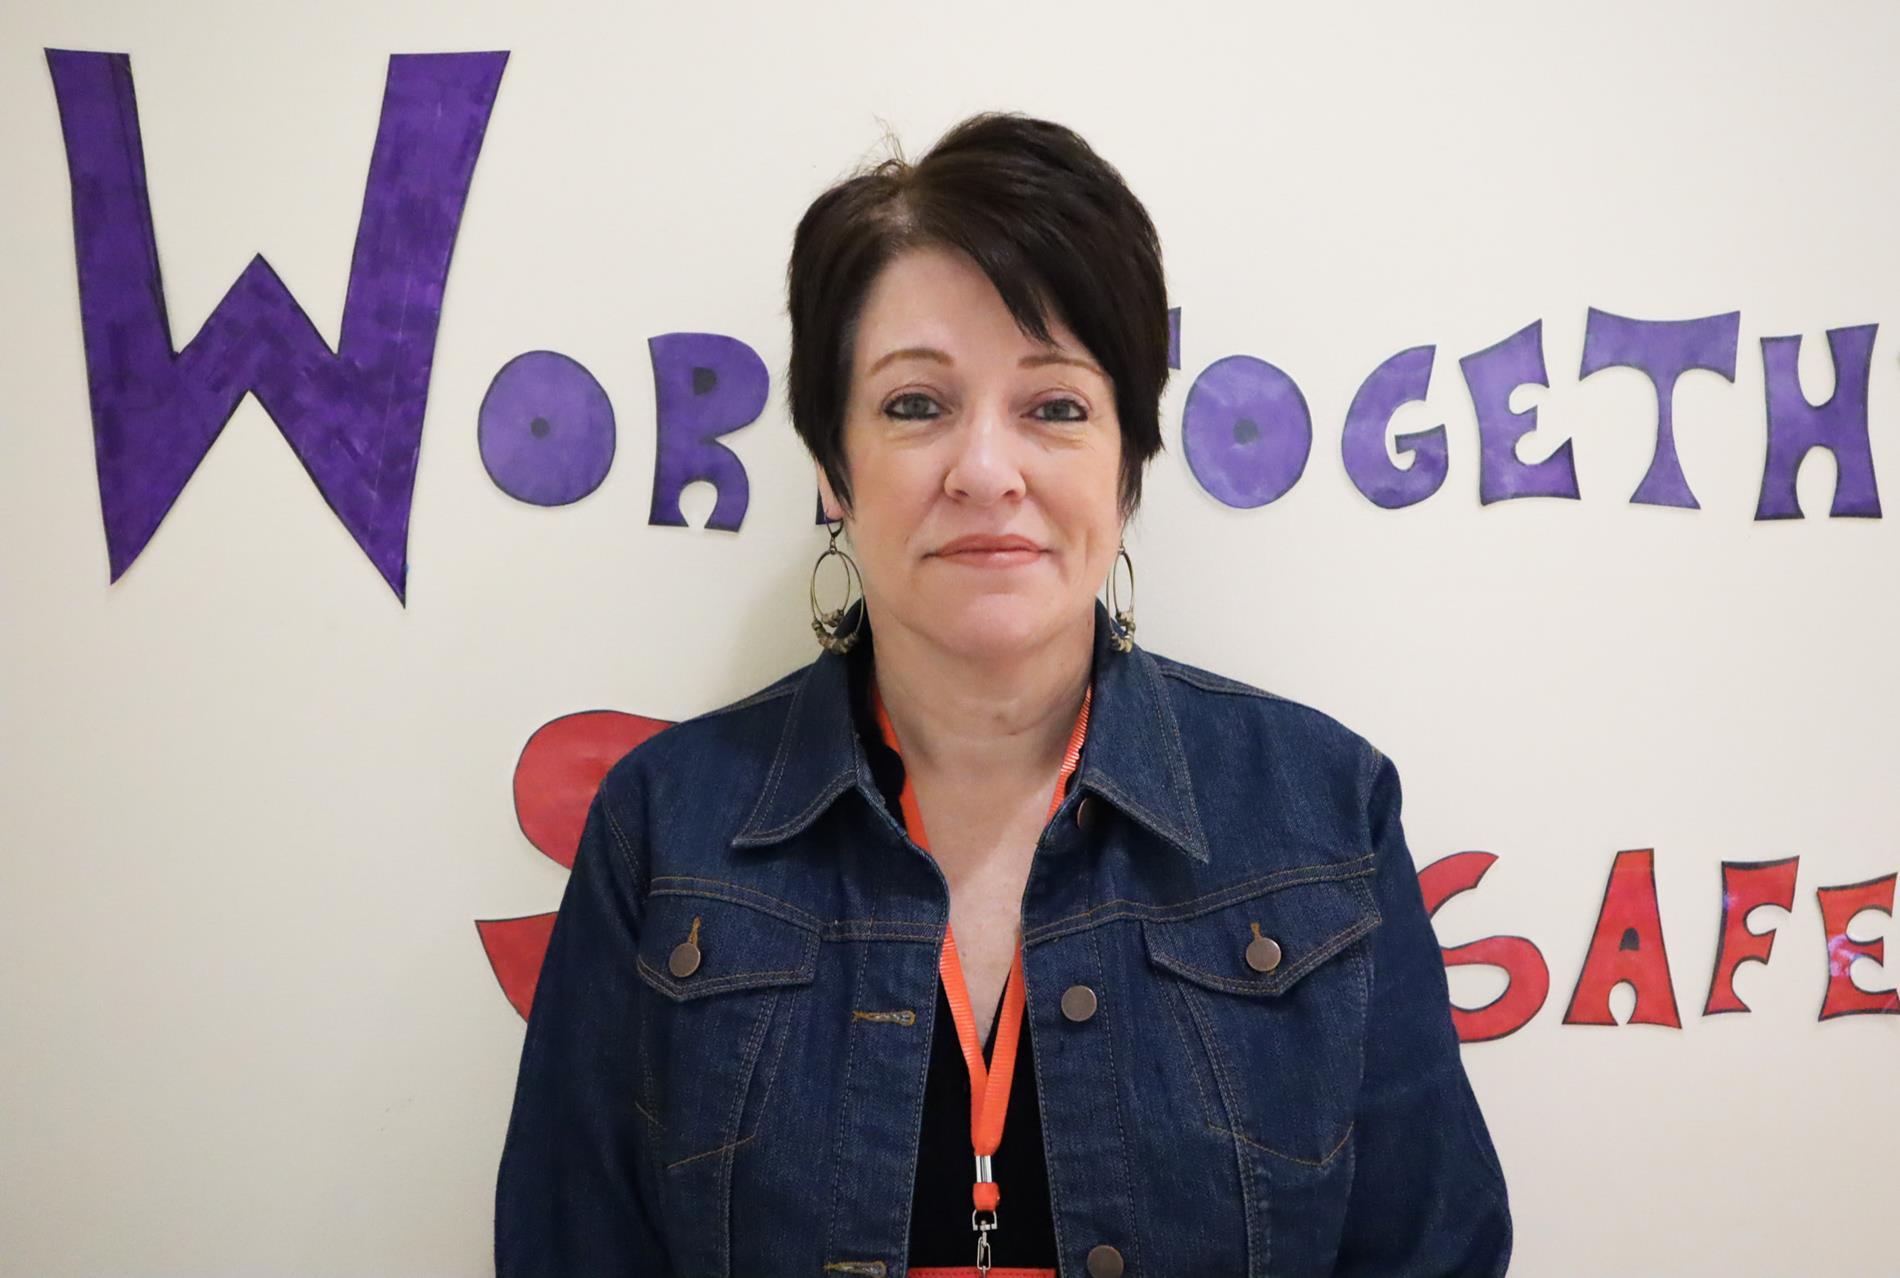 Ms. Ragsdale